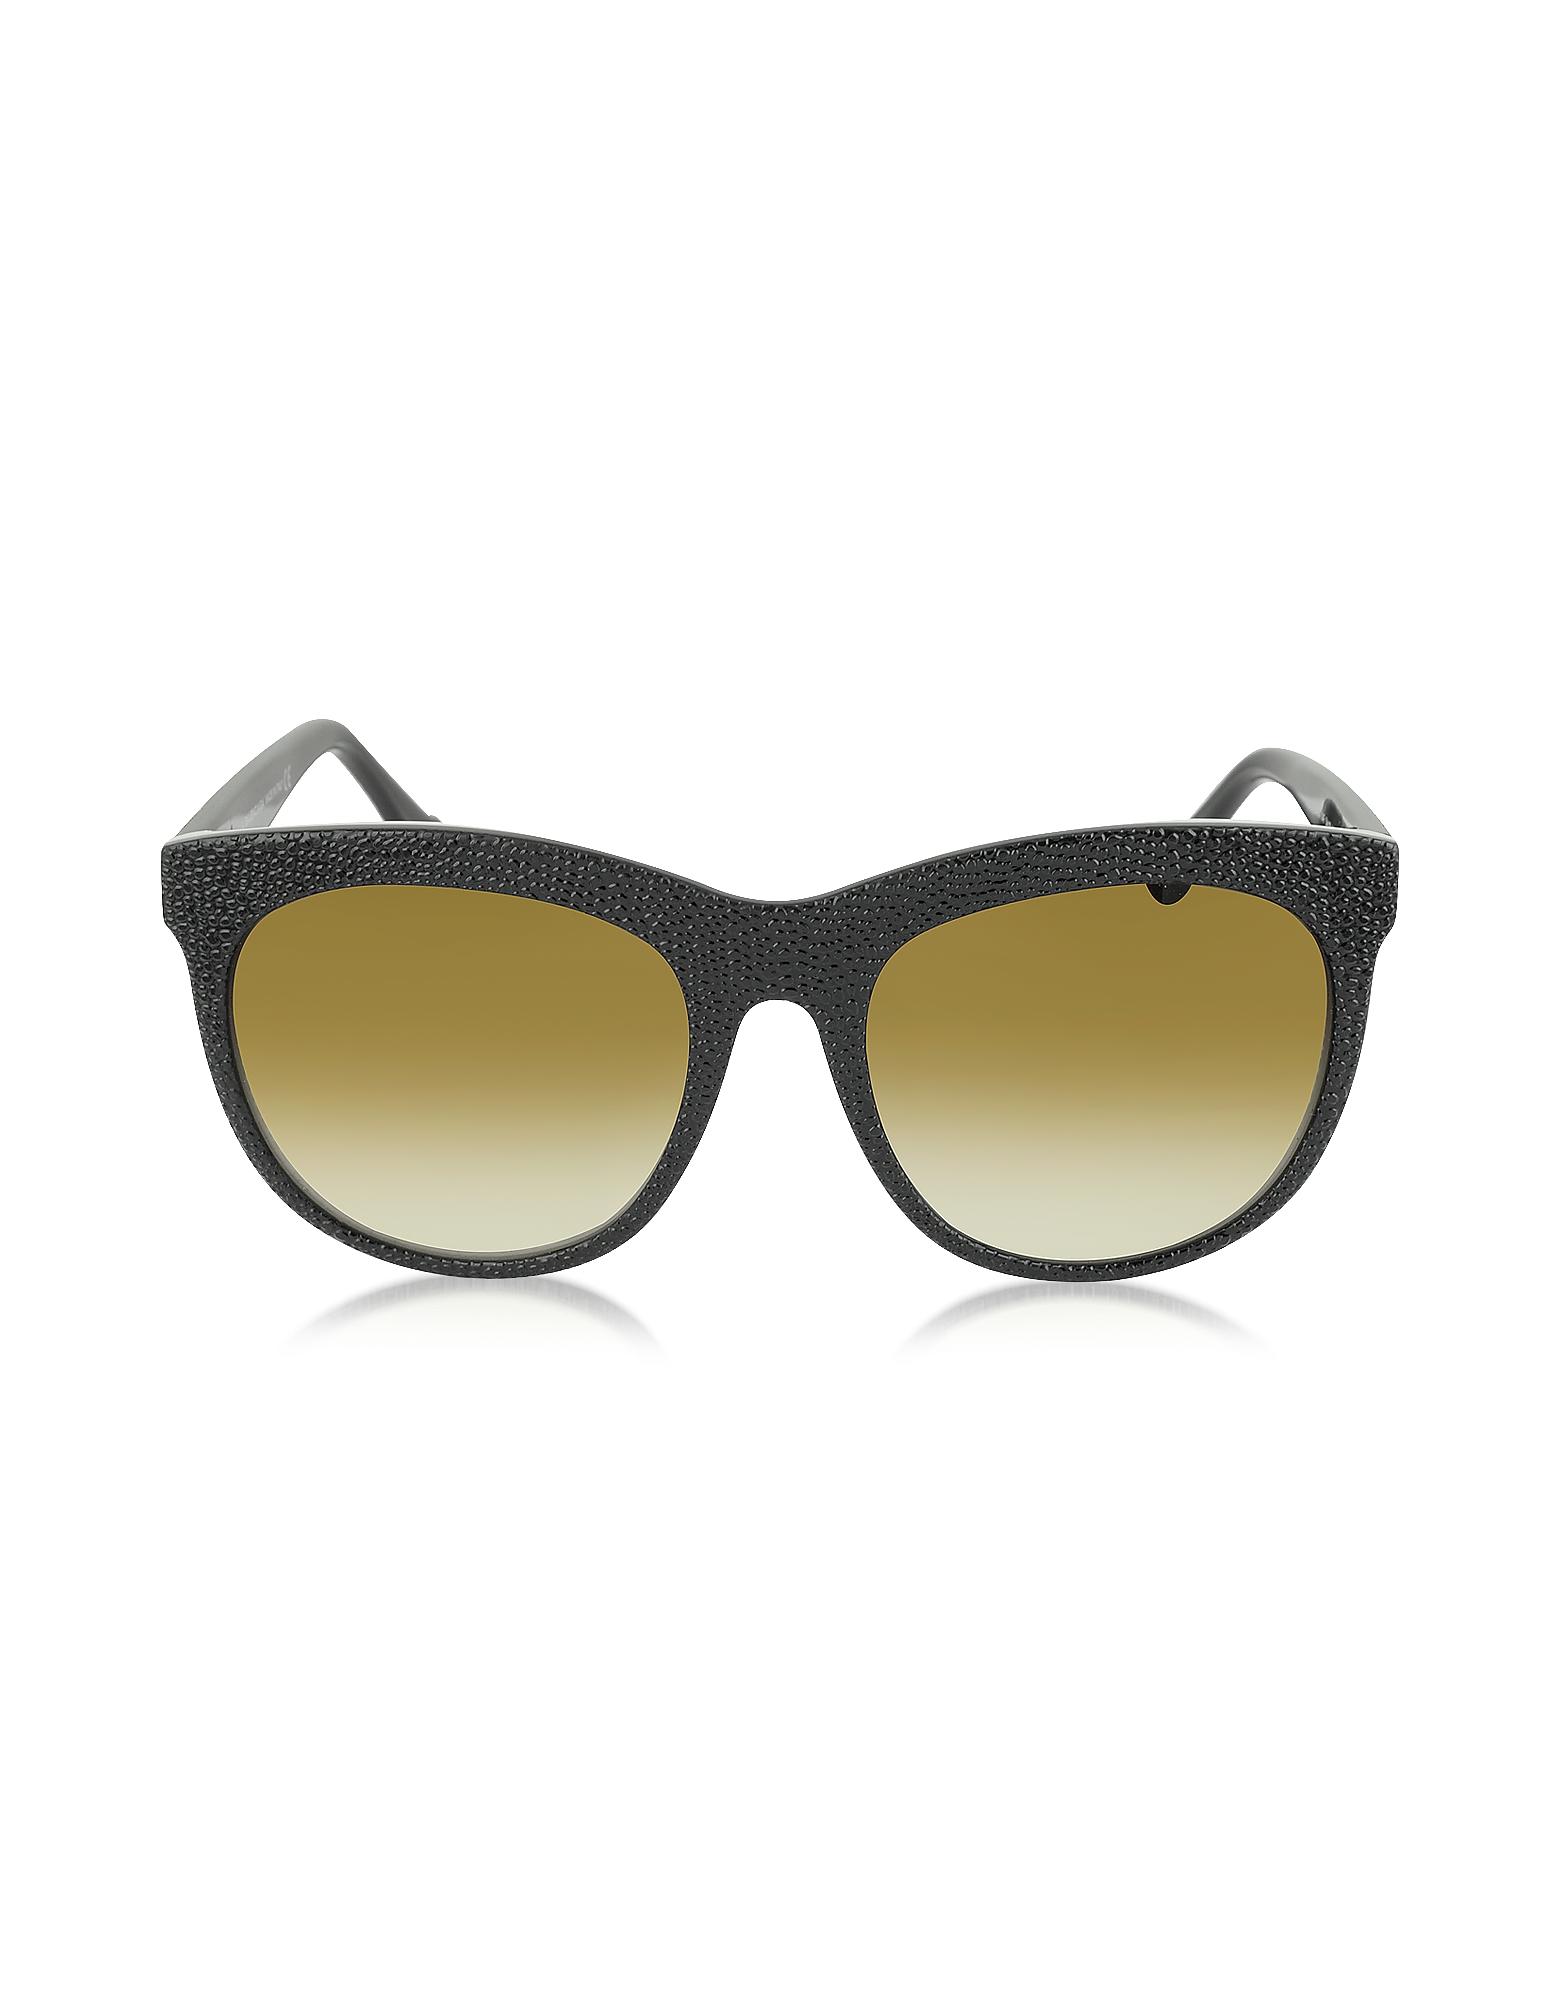 Image of Balenciaga Designer Sunglasses, BA0024 04F Black Rubber & Acetate Cat Eye Sunglasses